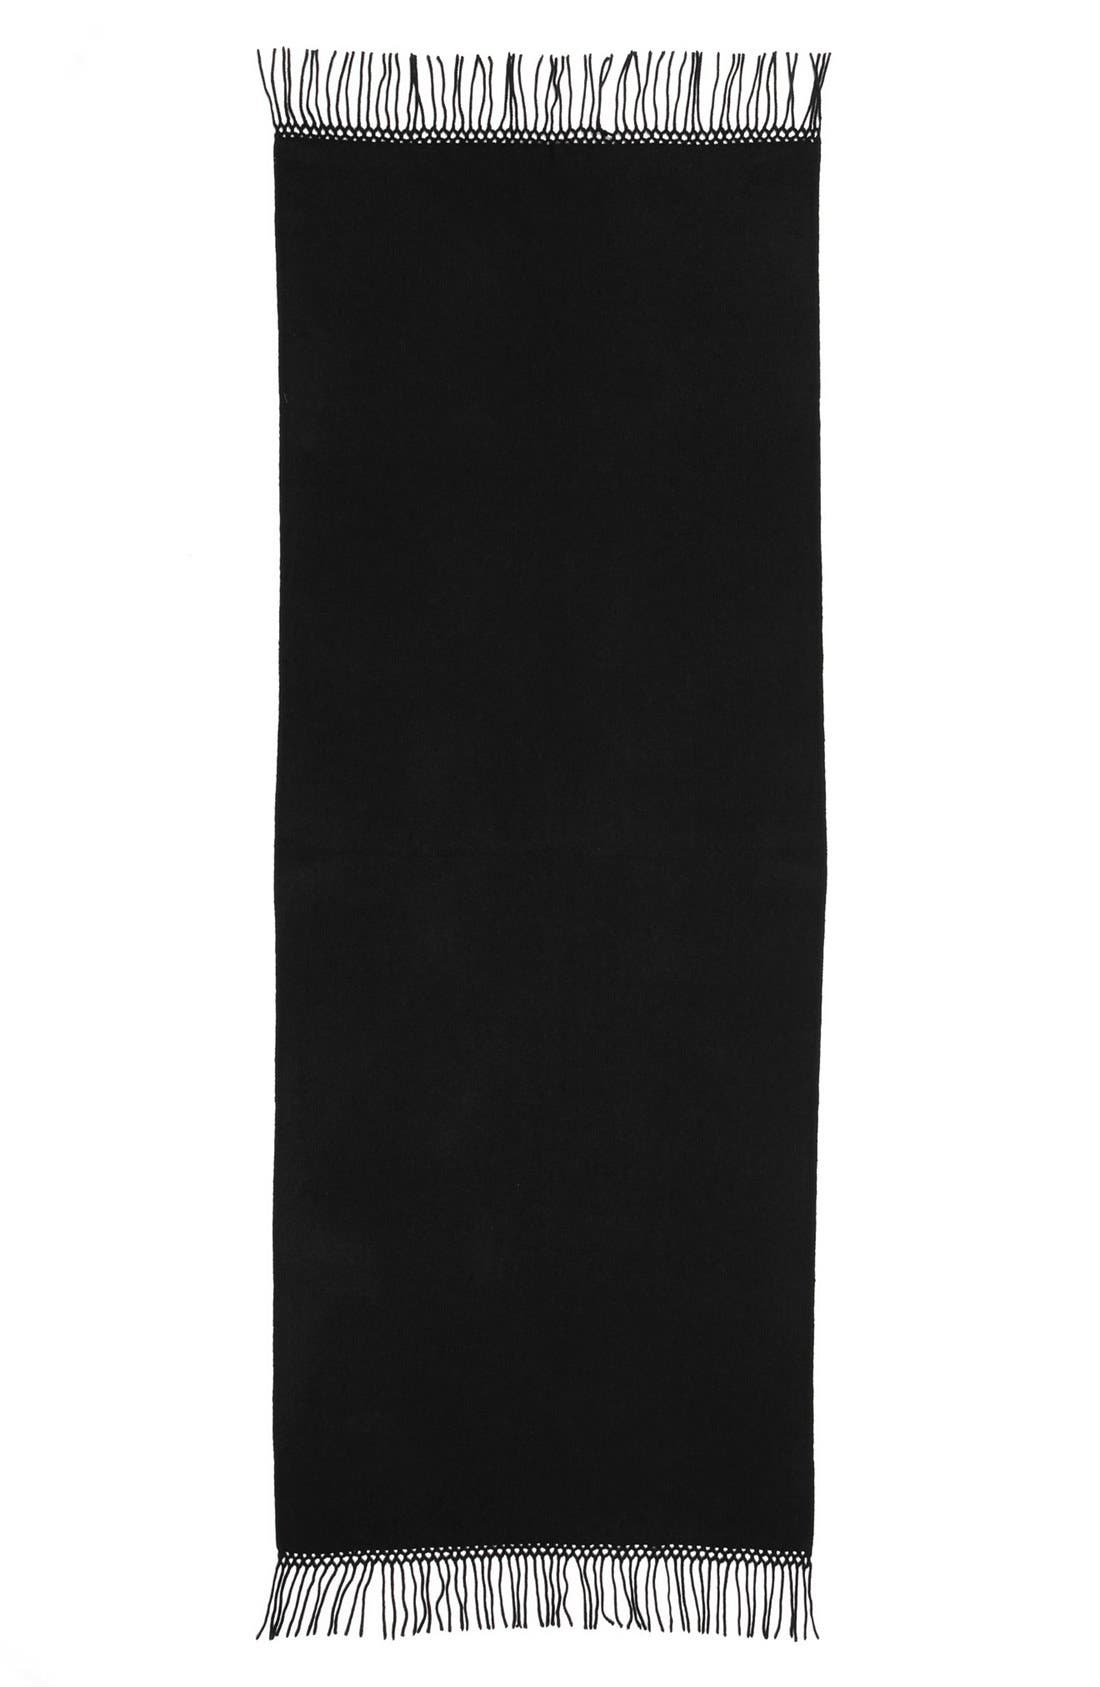 NORDSTROM,                             Woven Cashmere Wrap,                             Alternate thumbnail 2, color,                             001